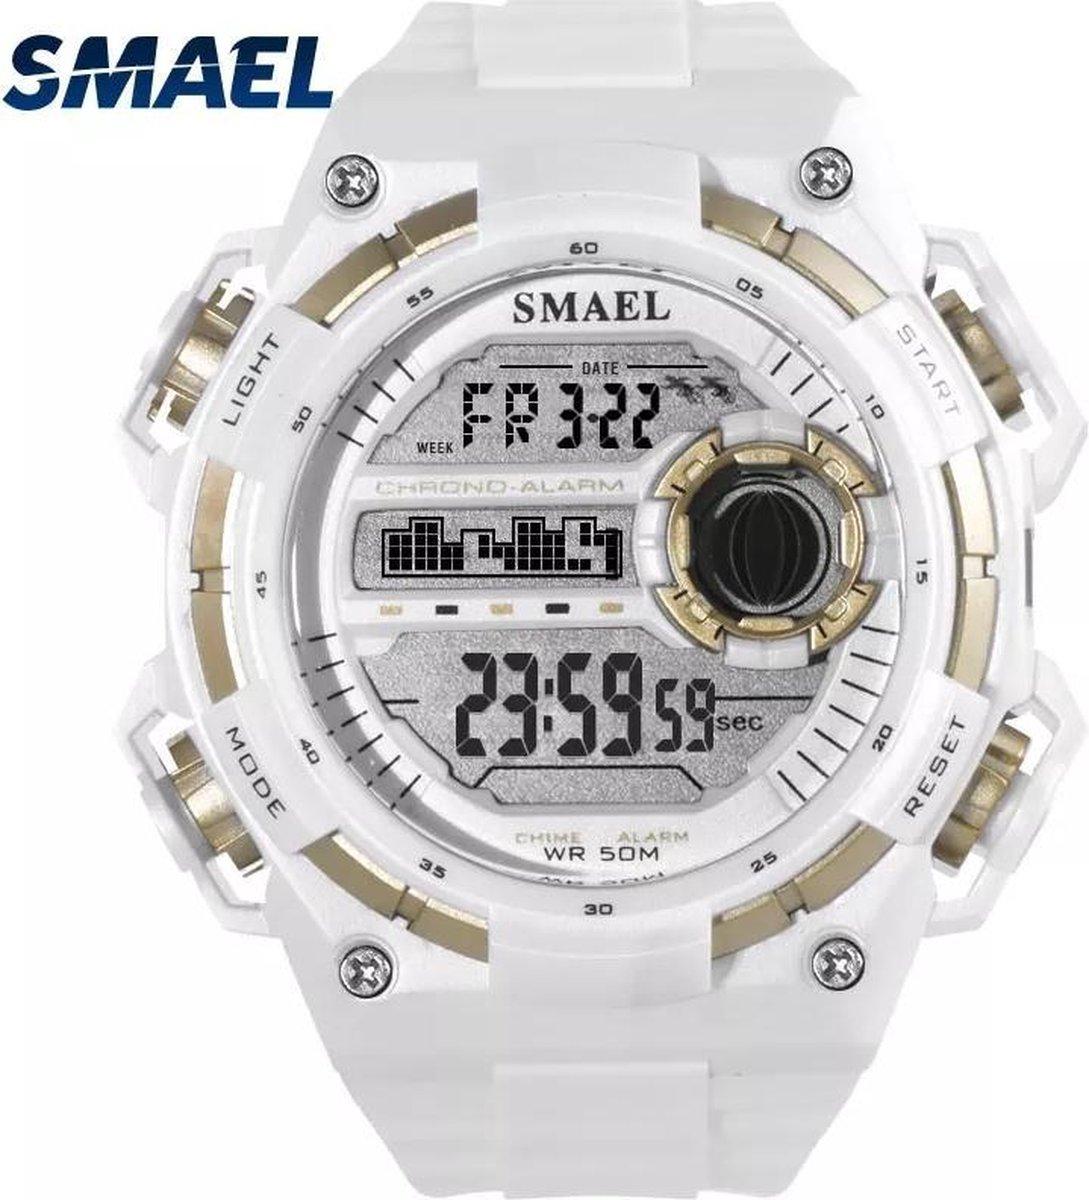 Smael Sport horloge Led Digital Waterdicht Wit 1438 - Smael